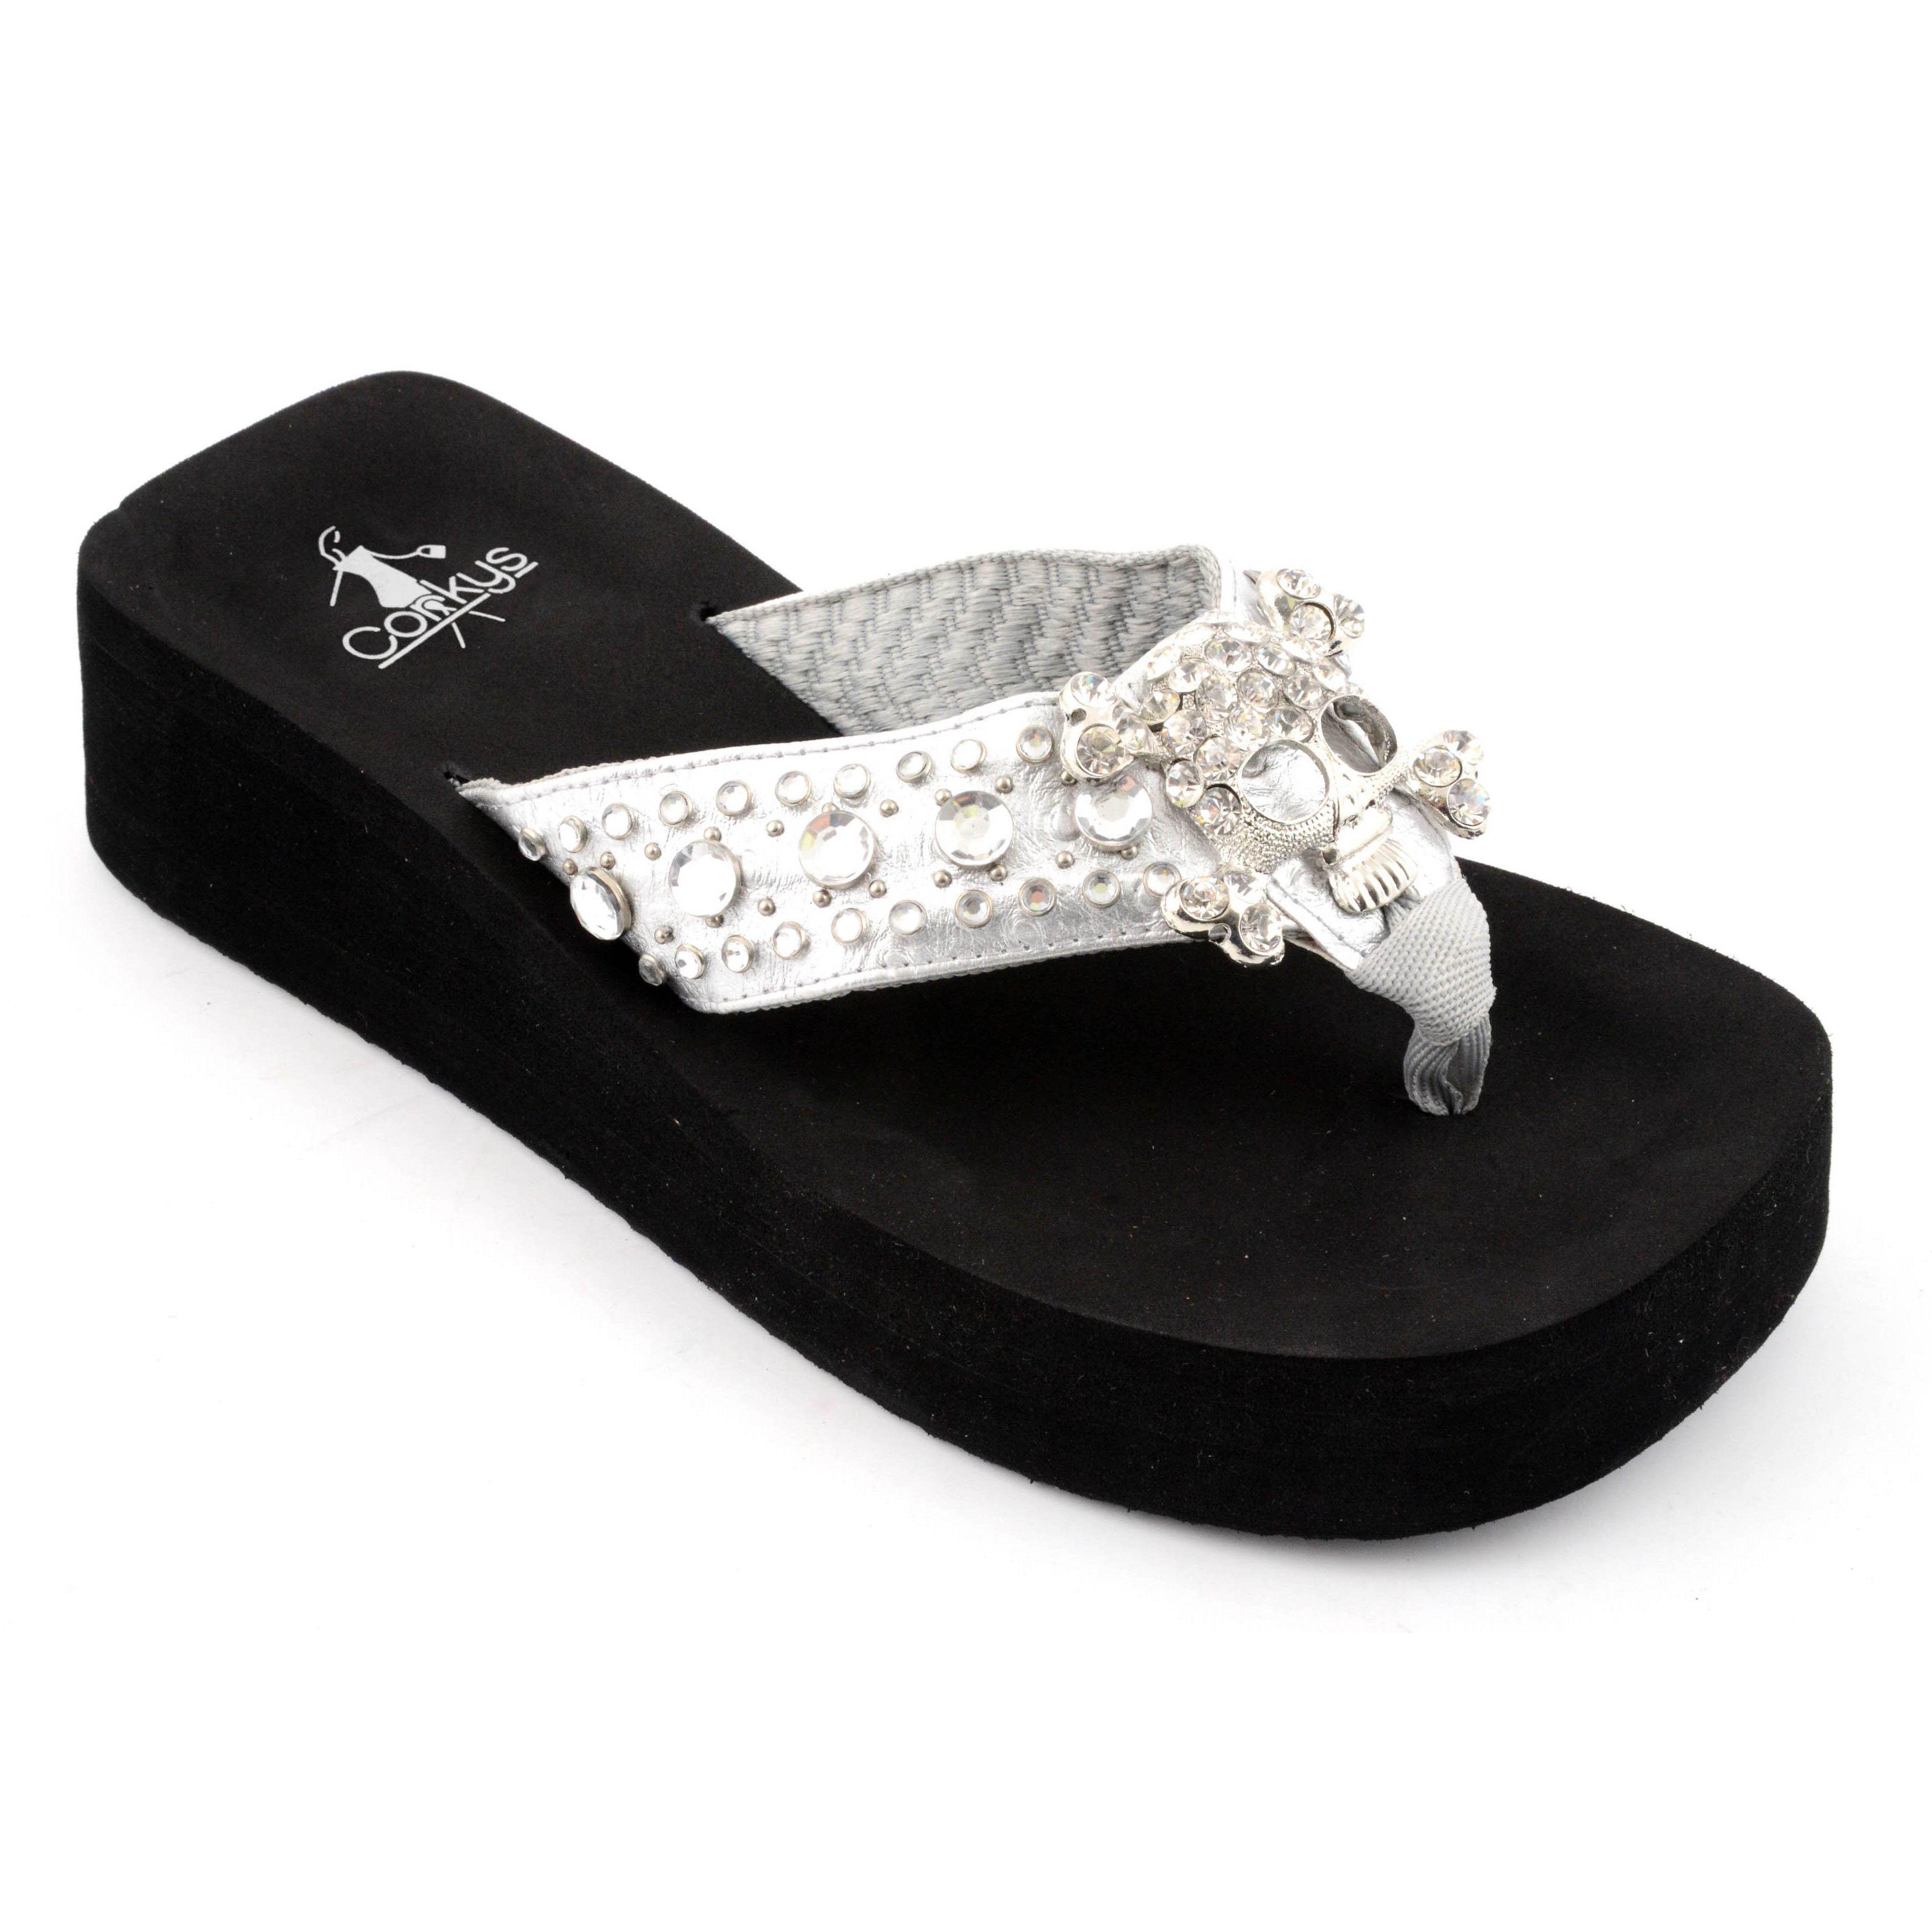 7b9dc64d3d31 Corkys Women s  Cher  Silver Metallic Wedge Sandals